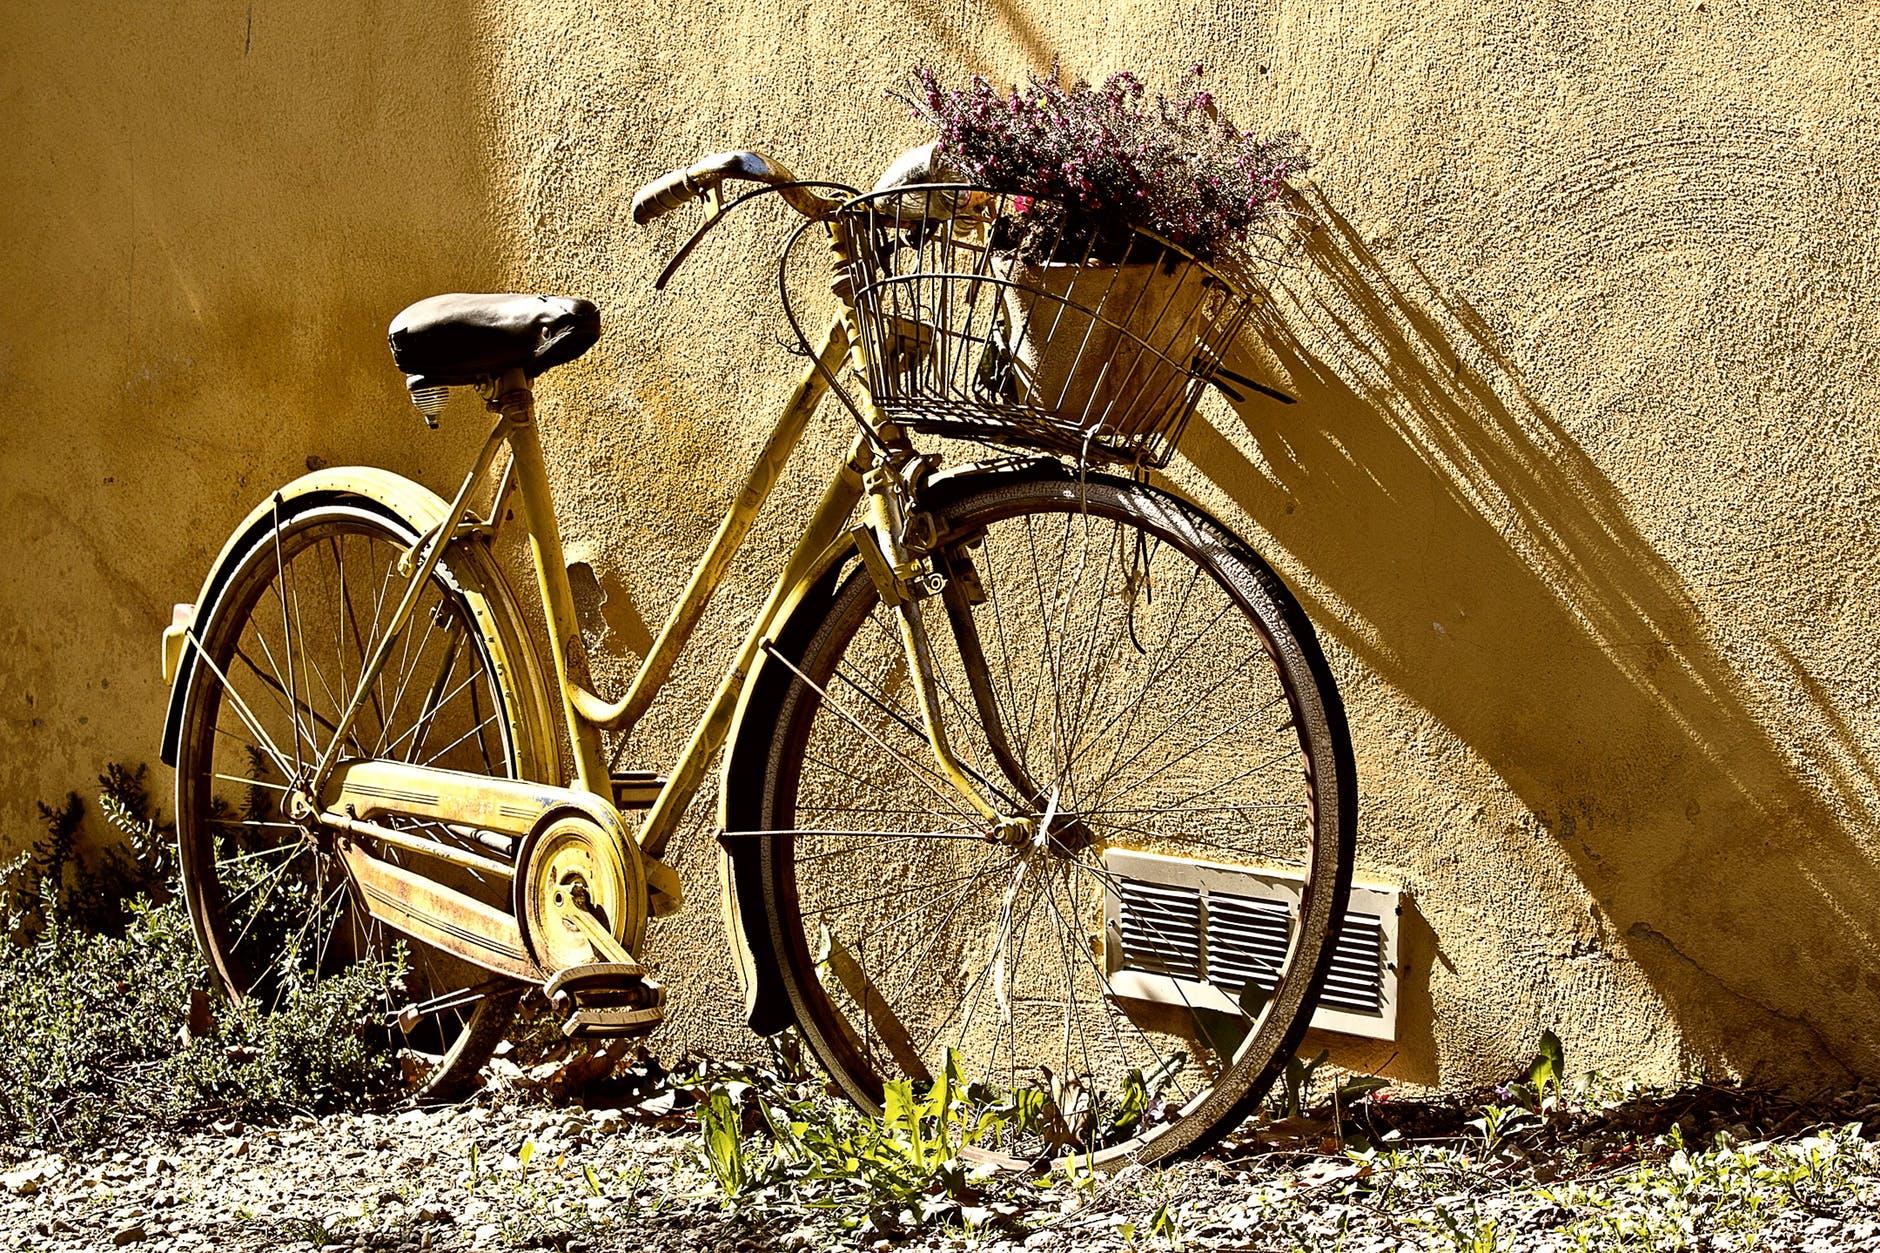 bike-bicycle-two-wheel-65689.jpg